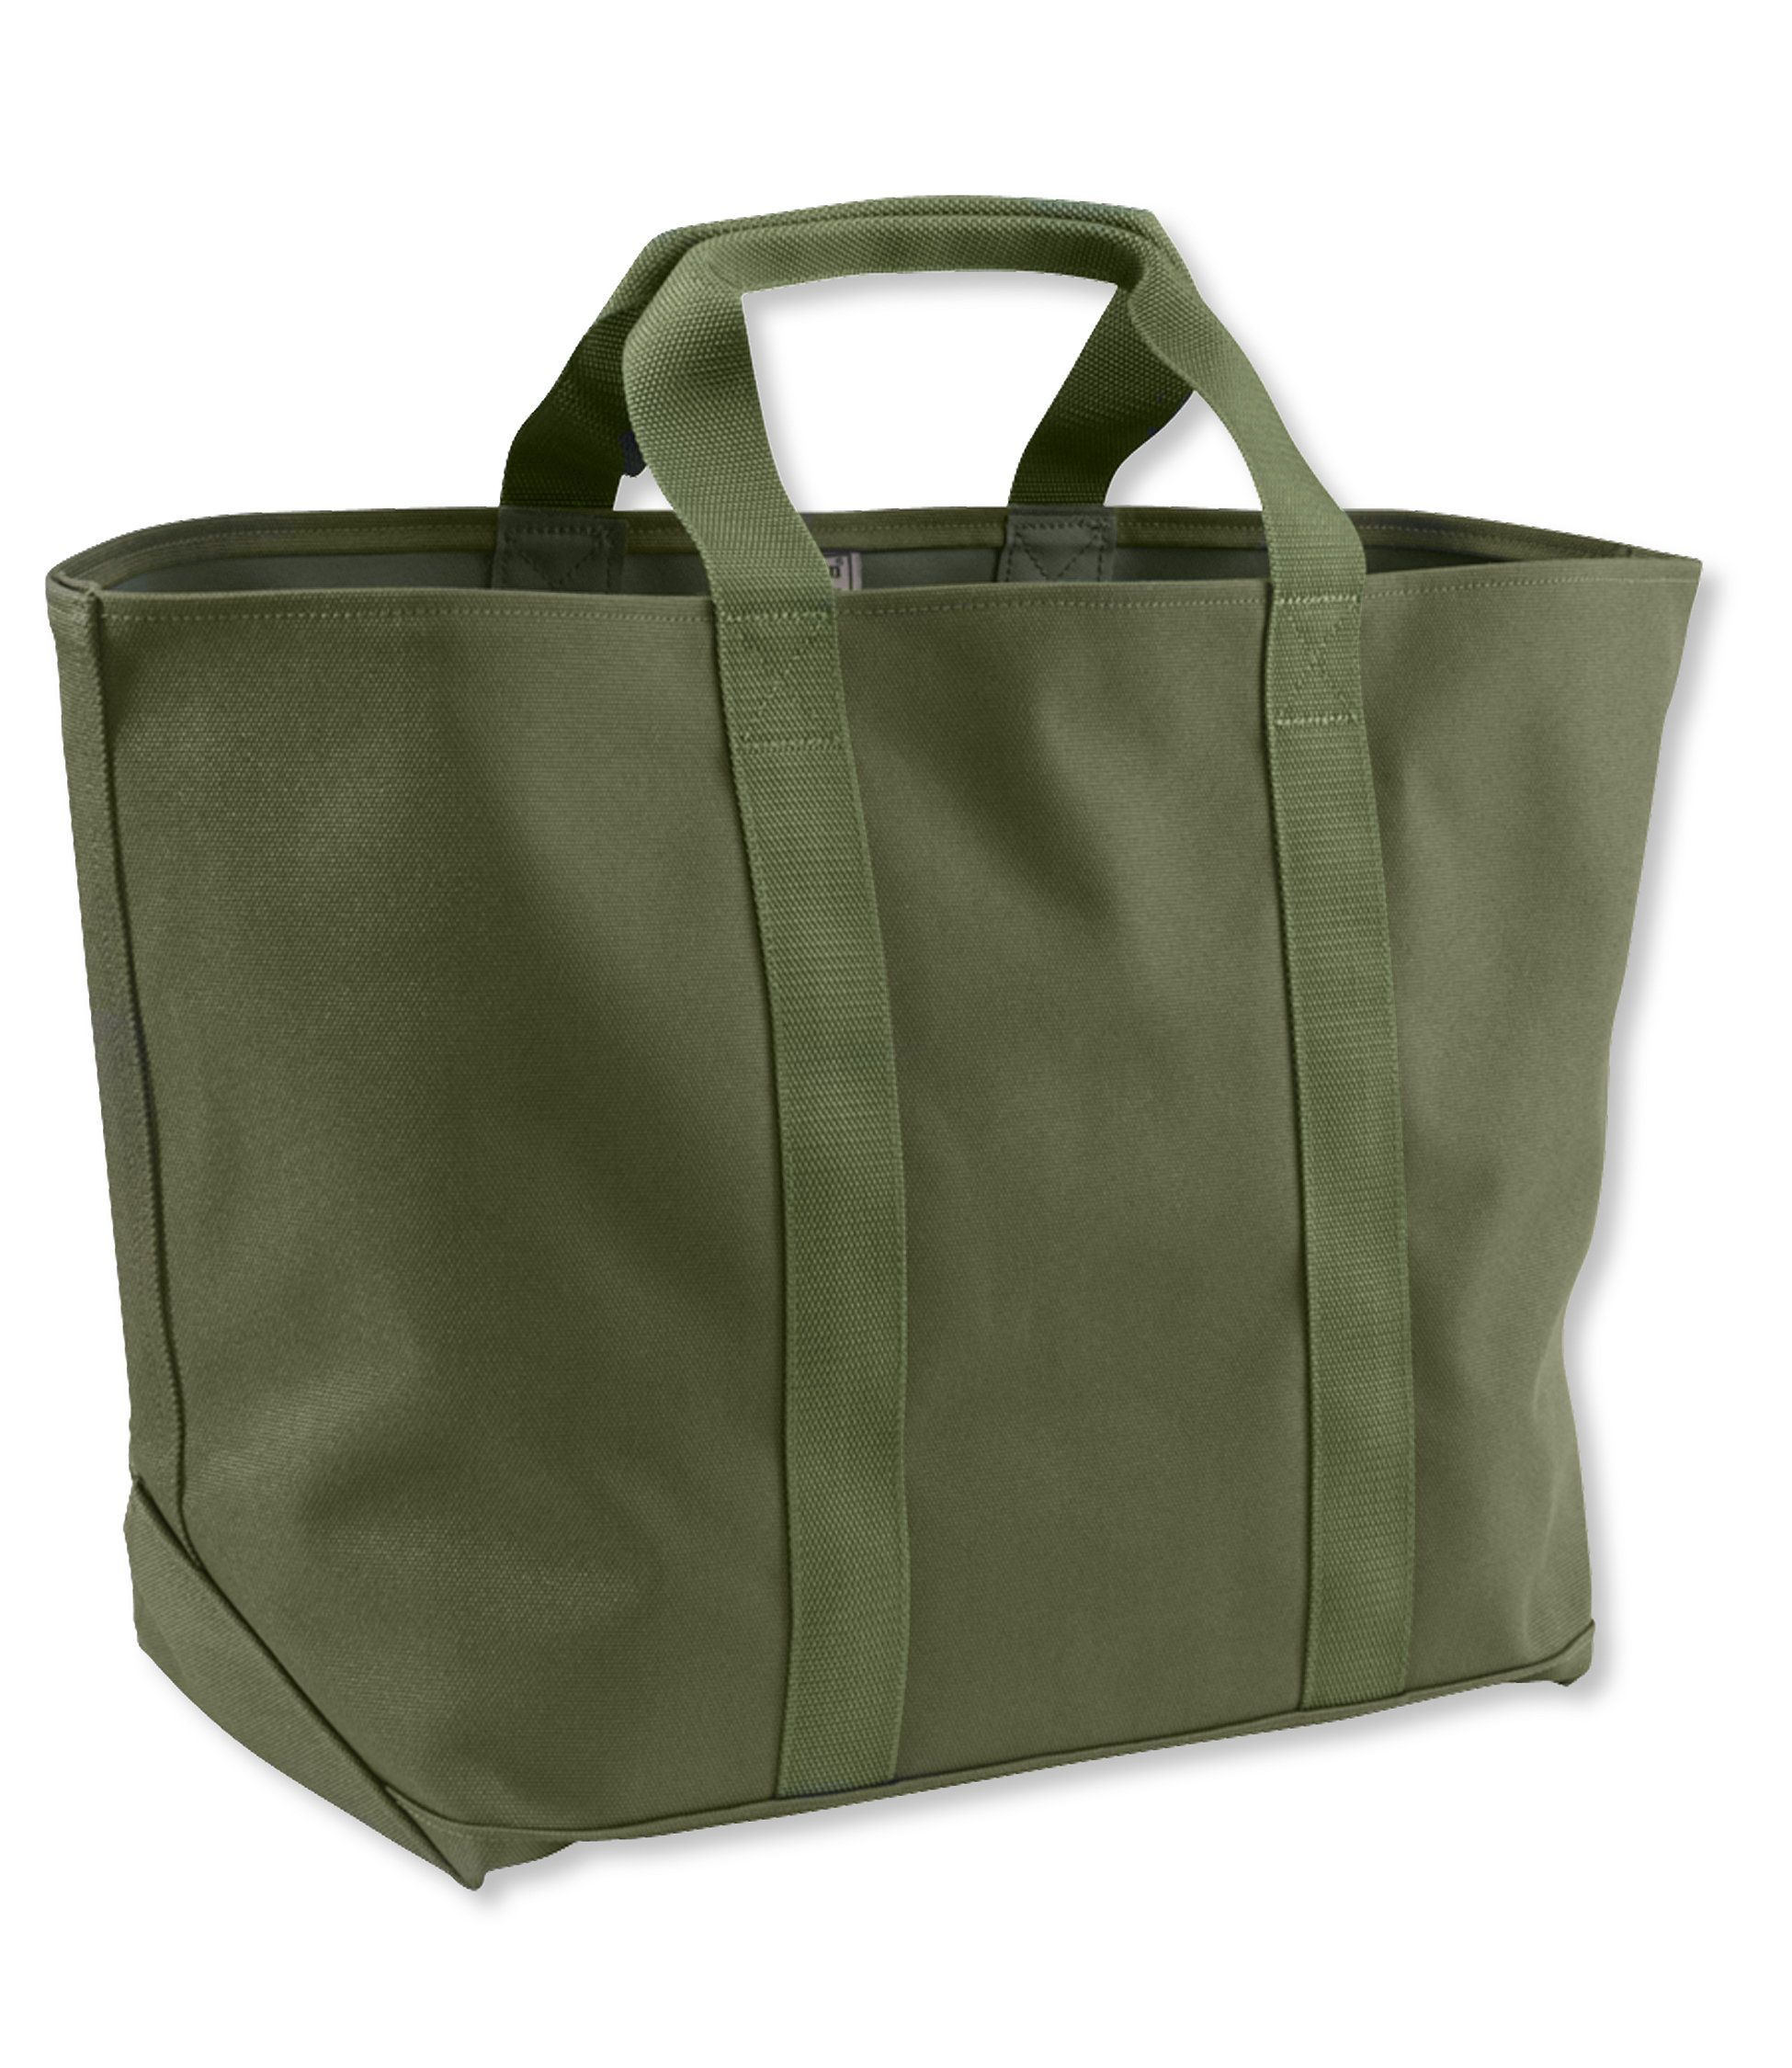 3c384599da09 Hunter s Tote Bag